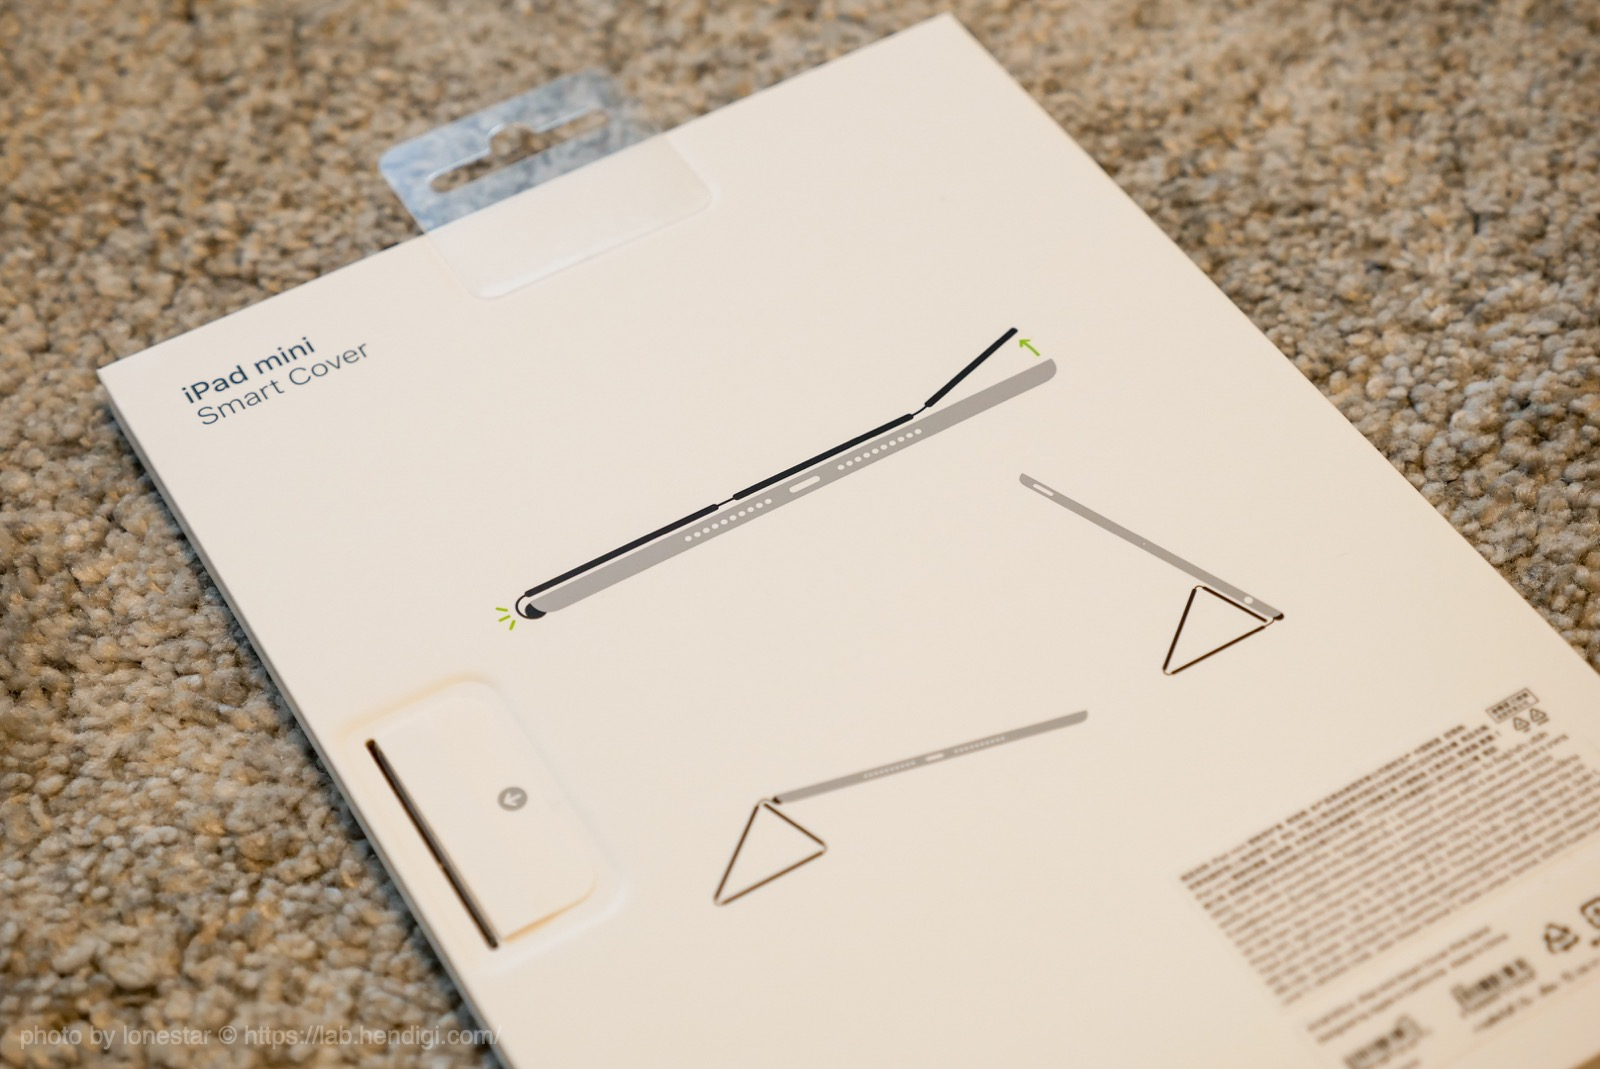 iPad mini Smart Cover レビュー